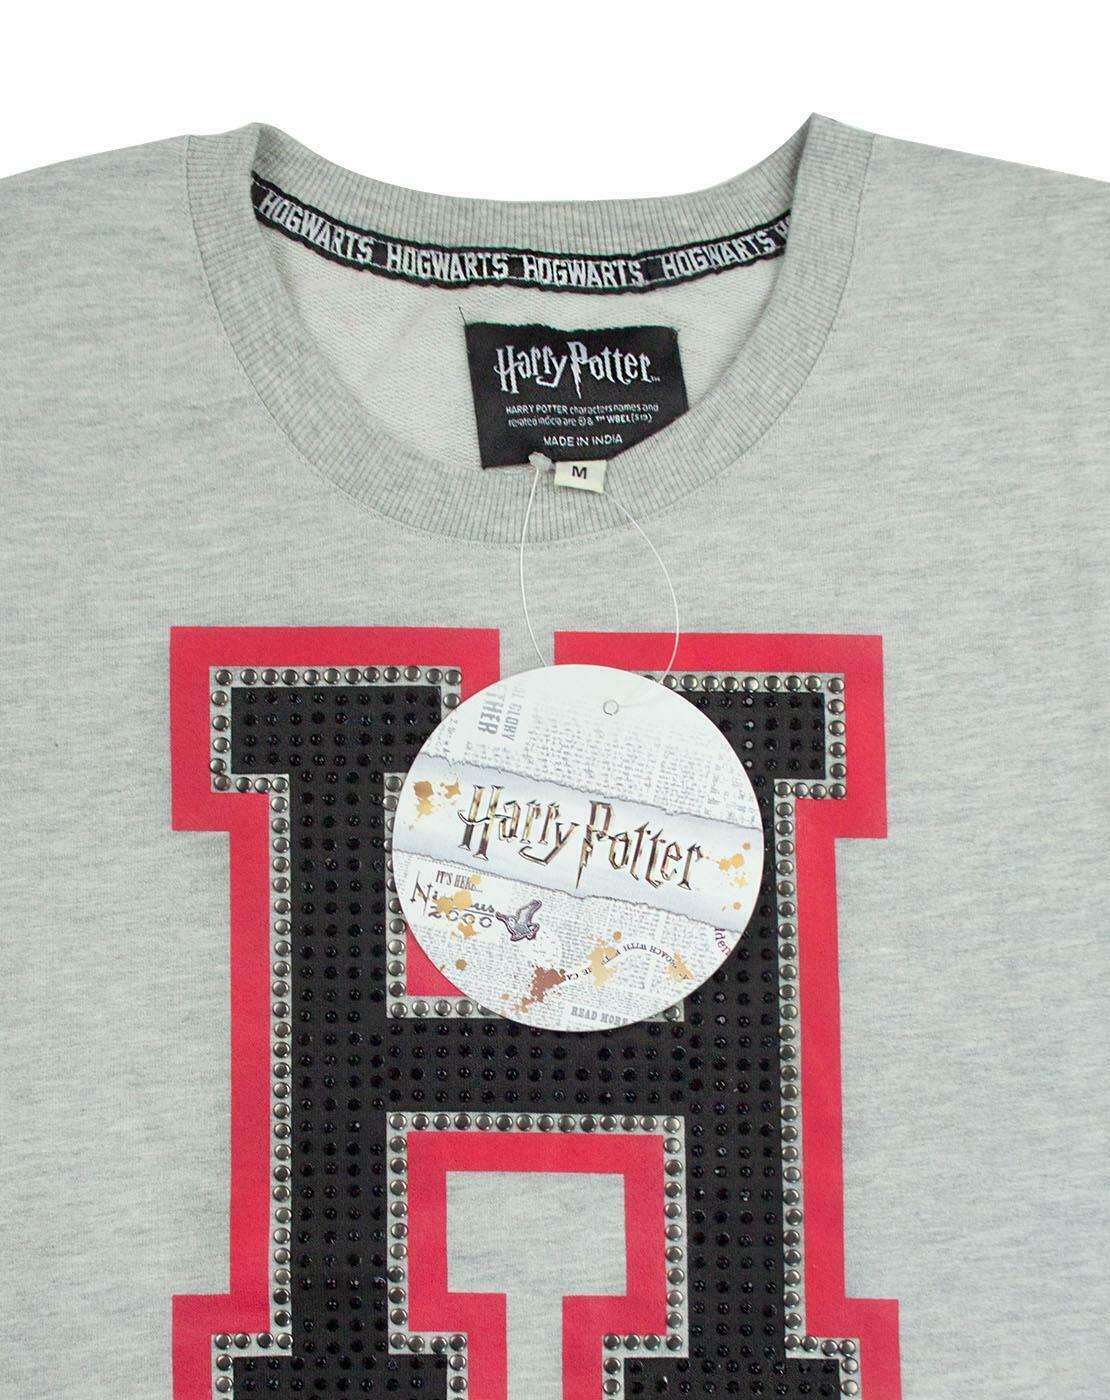 HOGWARTS ALUMNI Tshirt Top HARRY POTTER WIZARD Tank T shirt Ladies Women Girls